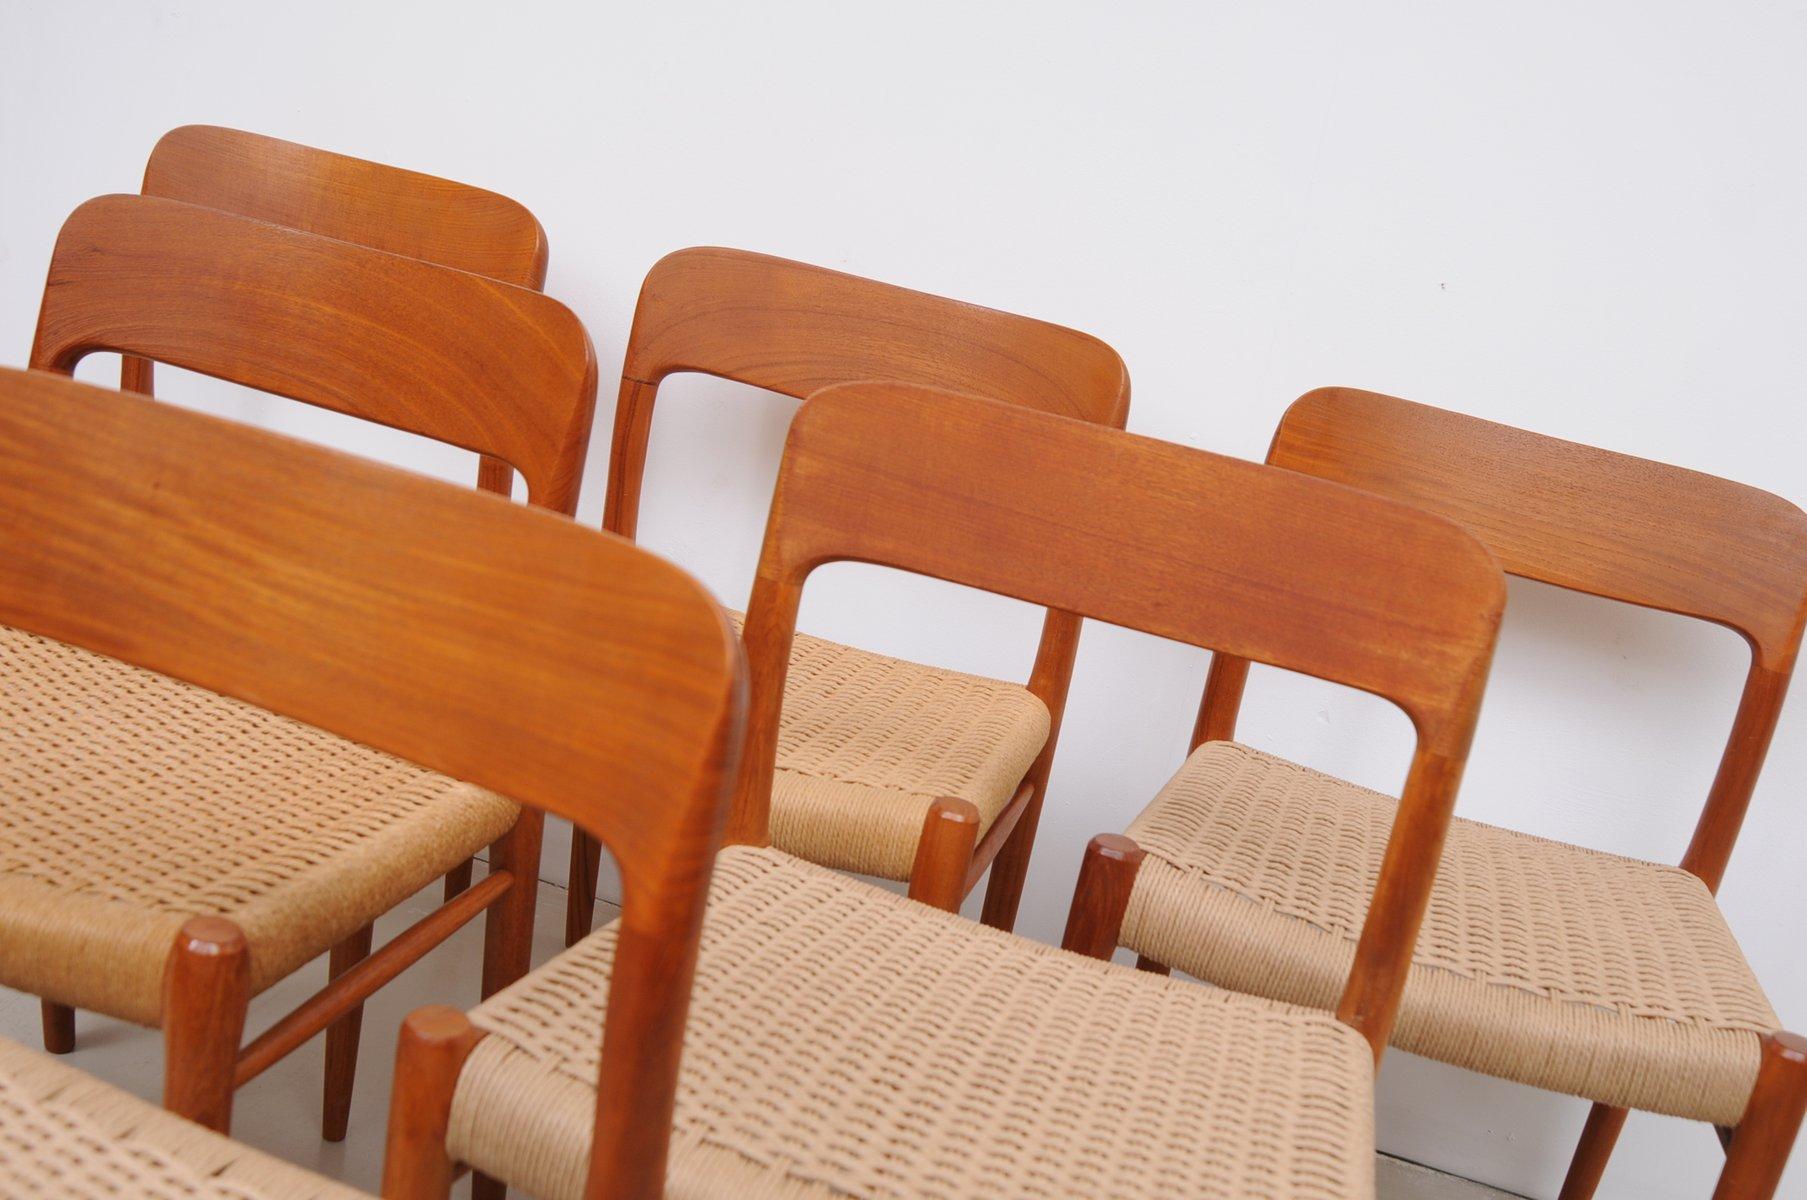 Danish Teak Chairs Mod 75 by Niels M¸ller for J L Müller 1950s